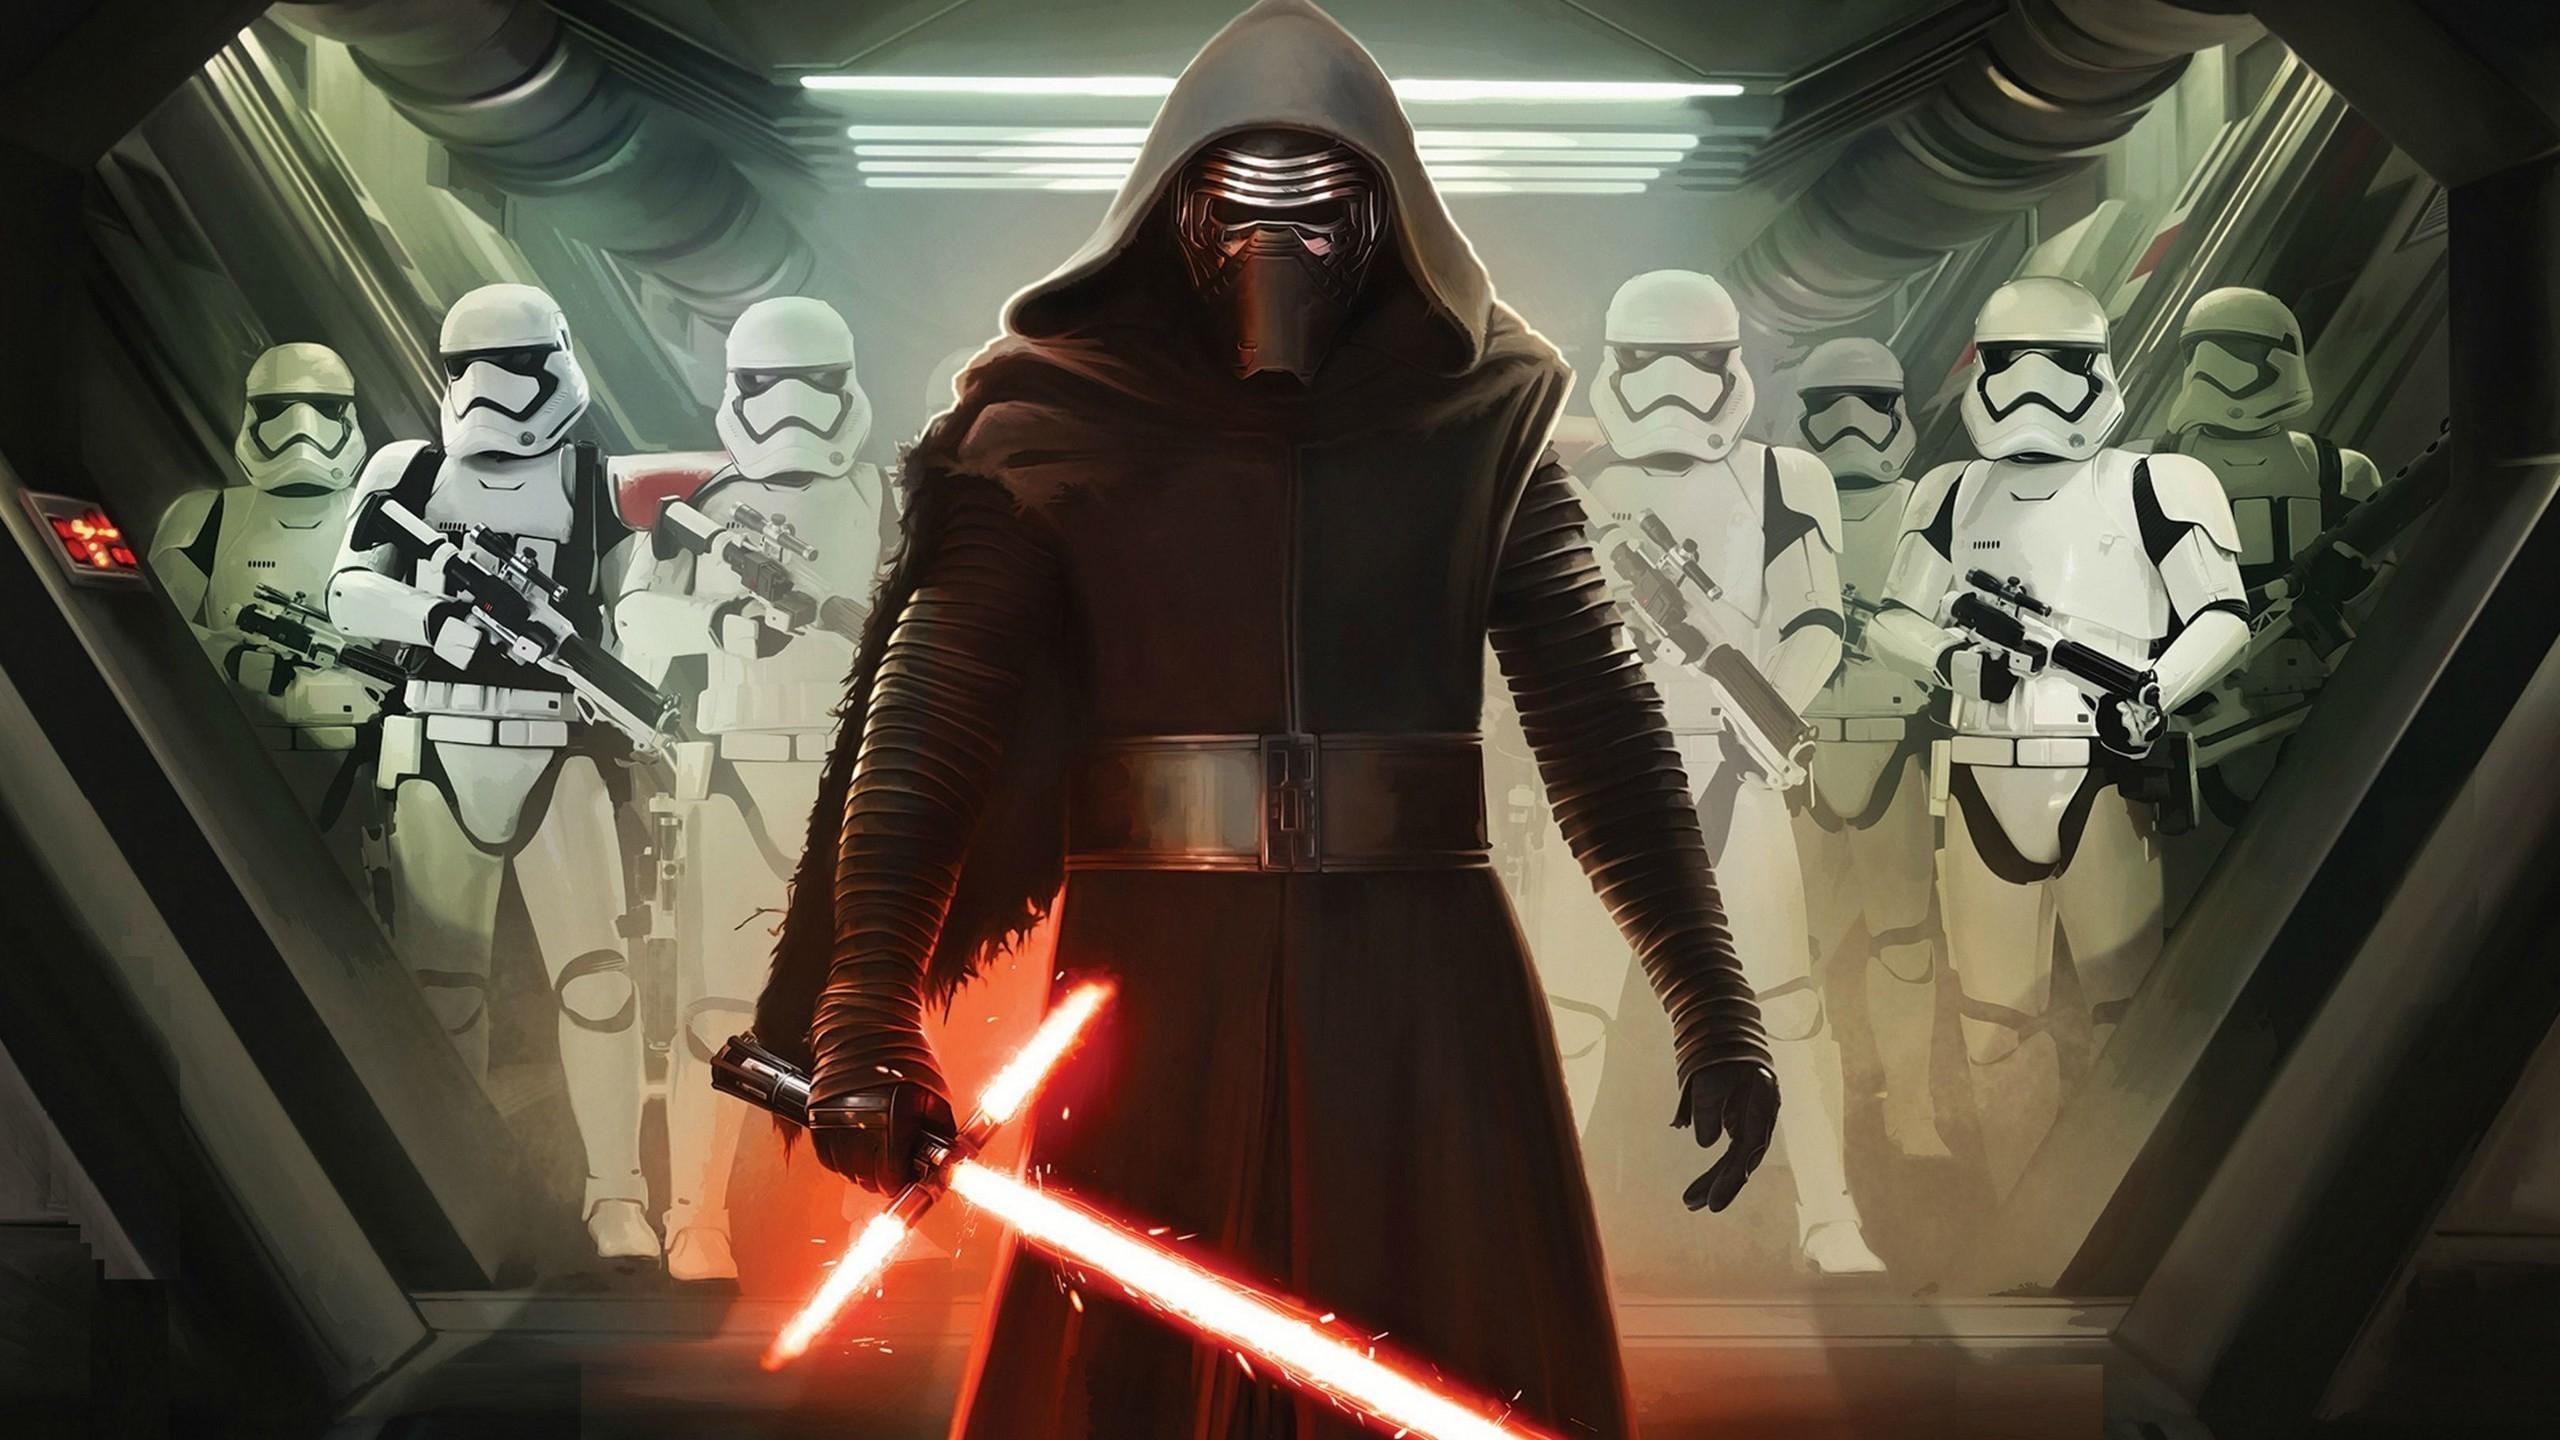 Star Wars Vii Darth Vader And Storm Troopers For Hdtv Star Wars Darth Vader And Stormtroopers 2560x1440 Wallpaper Teahub Io